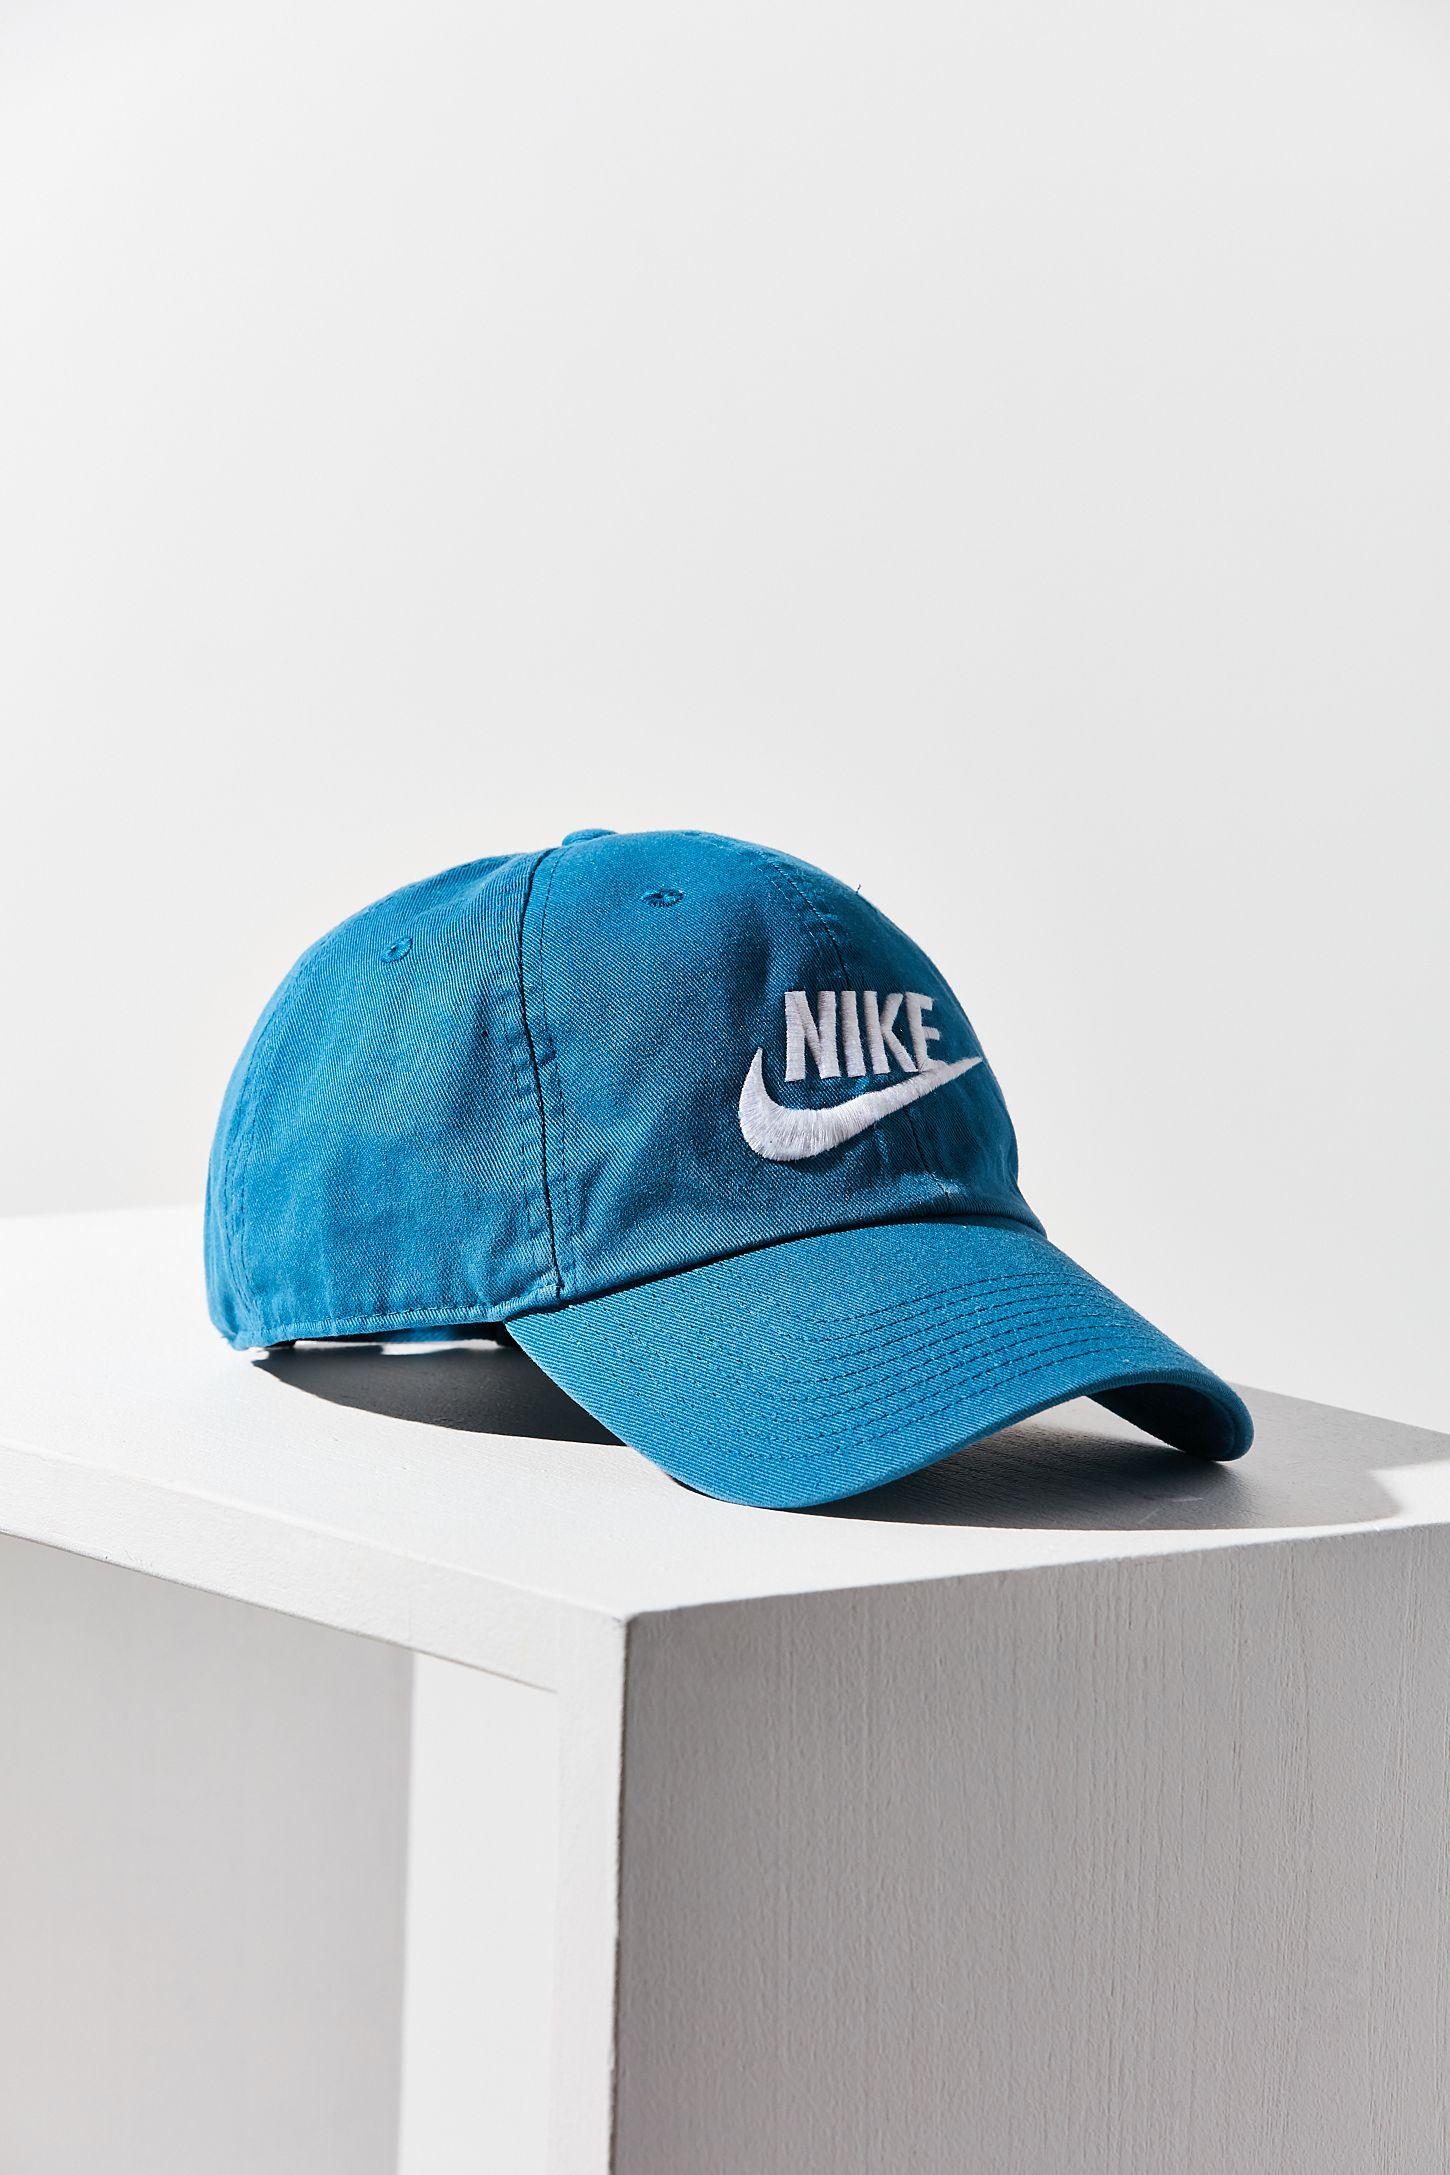 23025d1a3b4 Nike Heritage 86 Futura Logo Strapback Hat